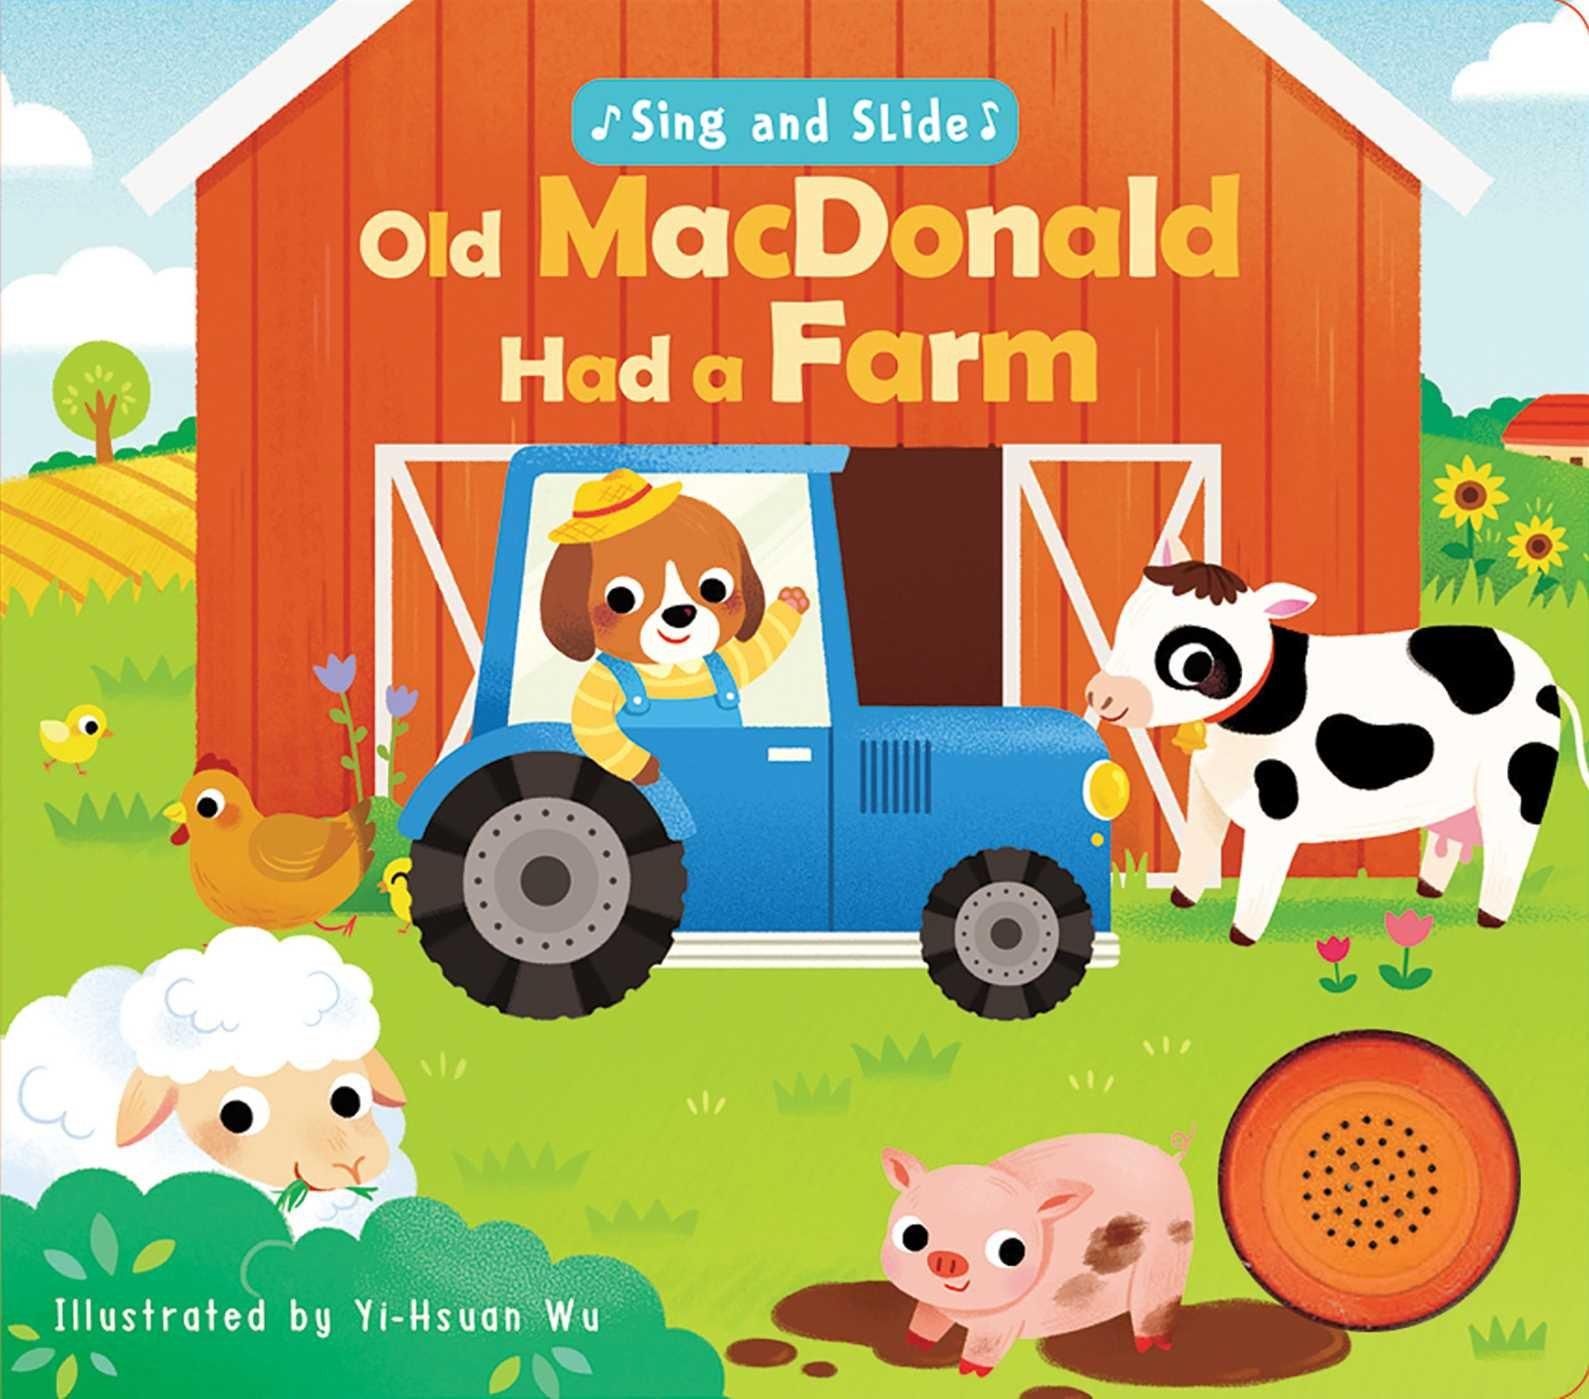 Amazon Com Sing And Slide Old Macdonald Had A Farm 9781684121236 Wu Yi Hsuan Books